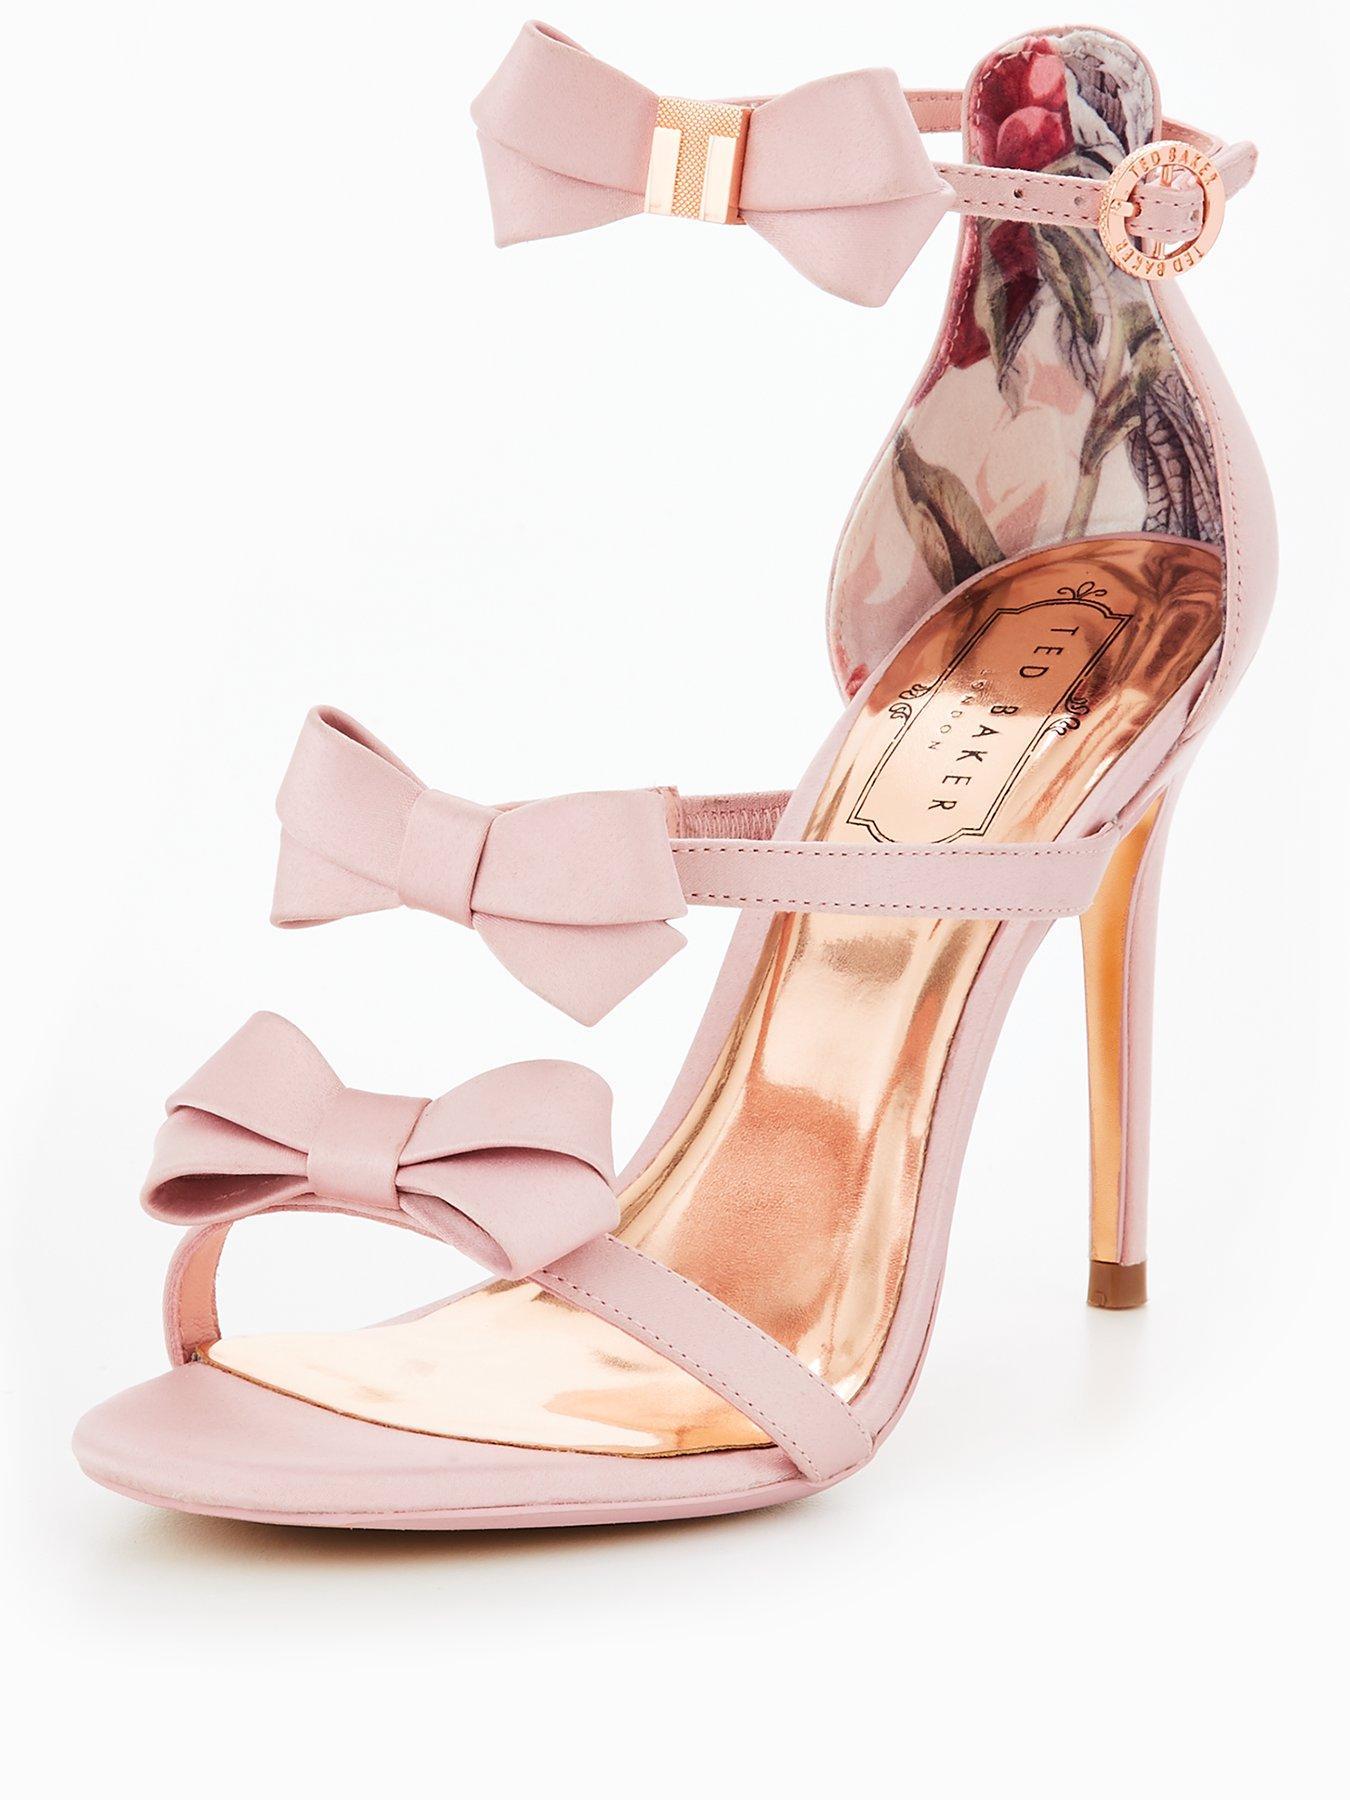 ted baker shoes white 2017 running week calendar